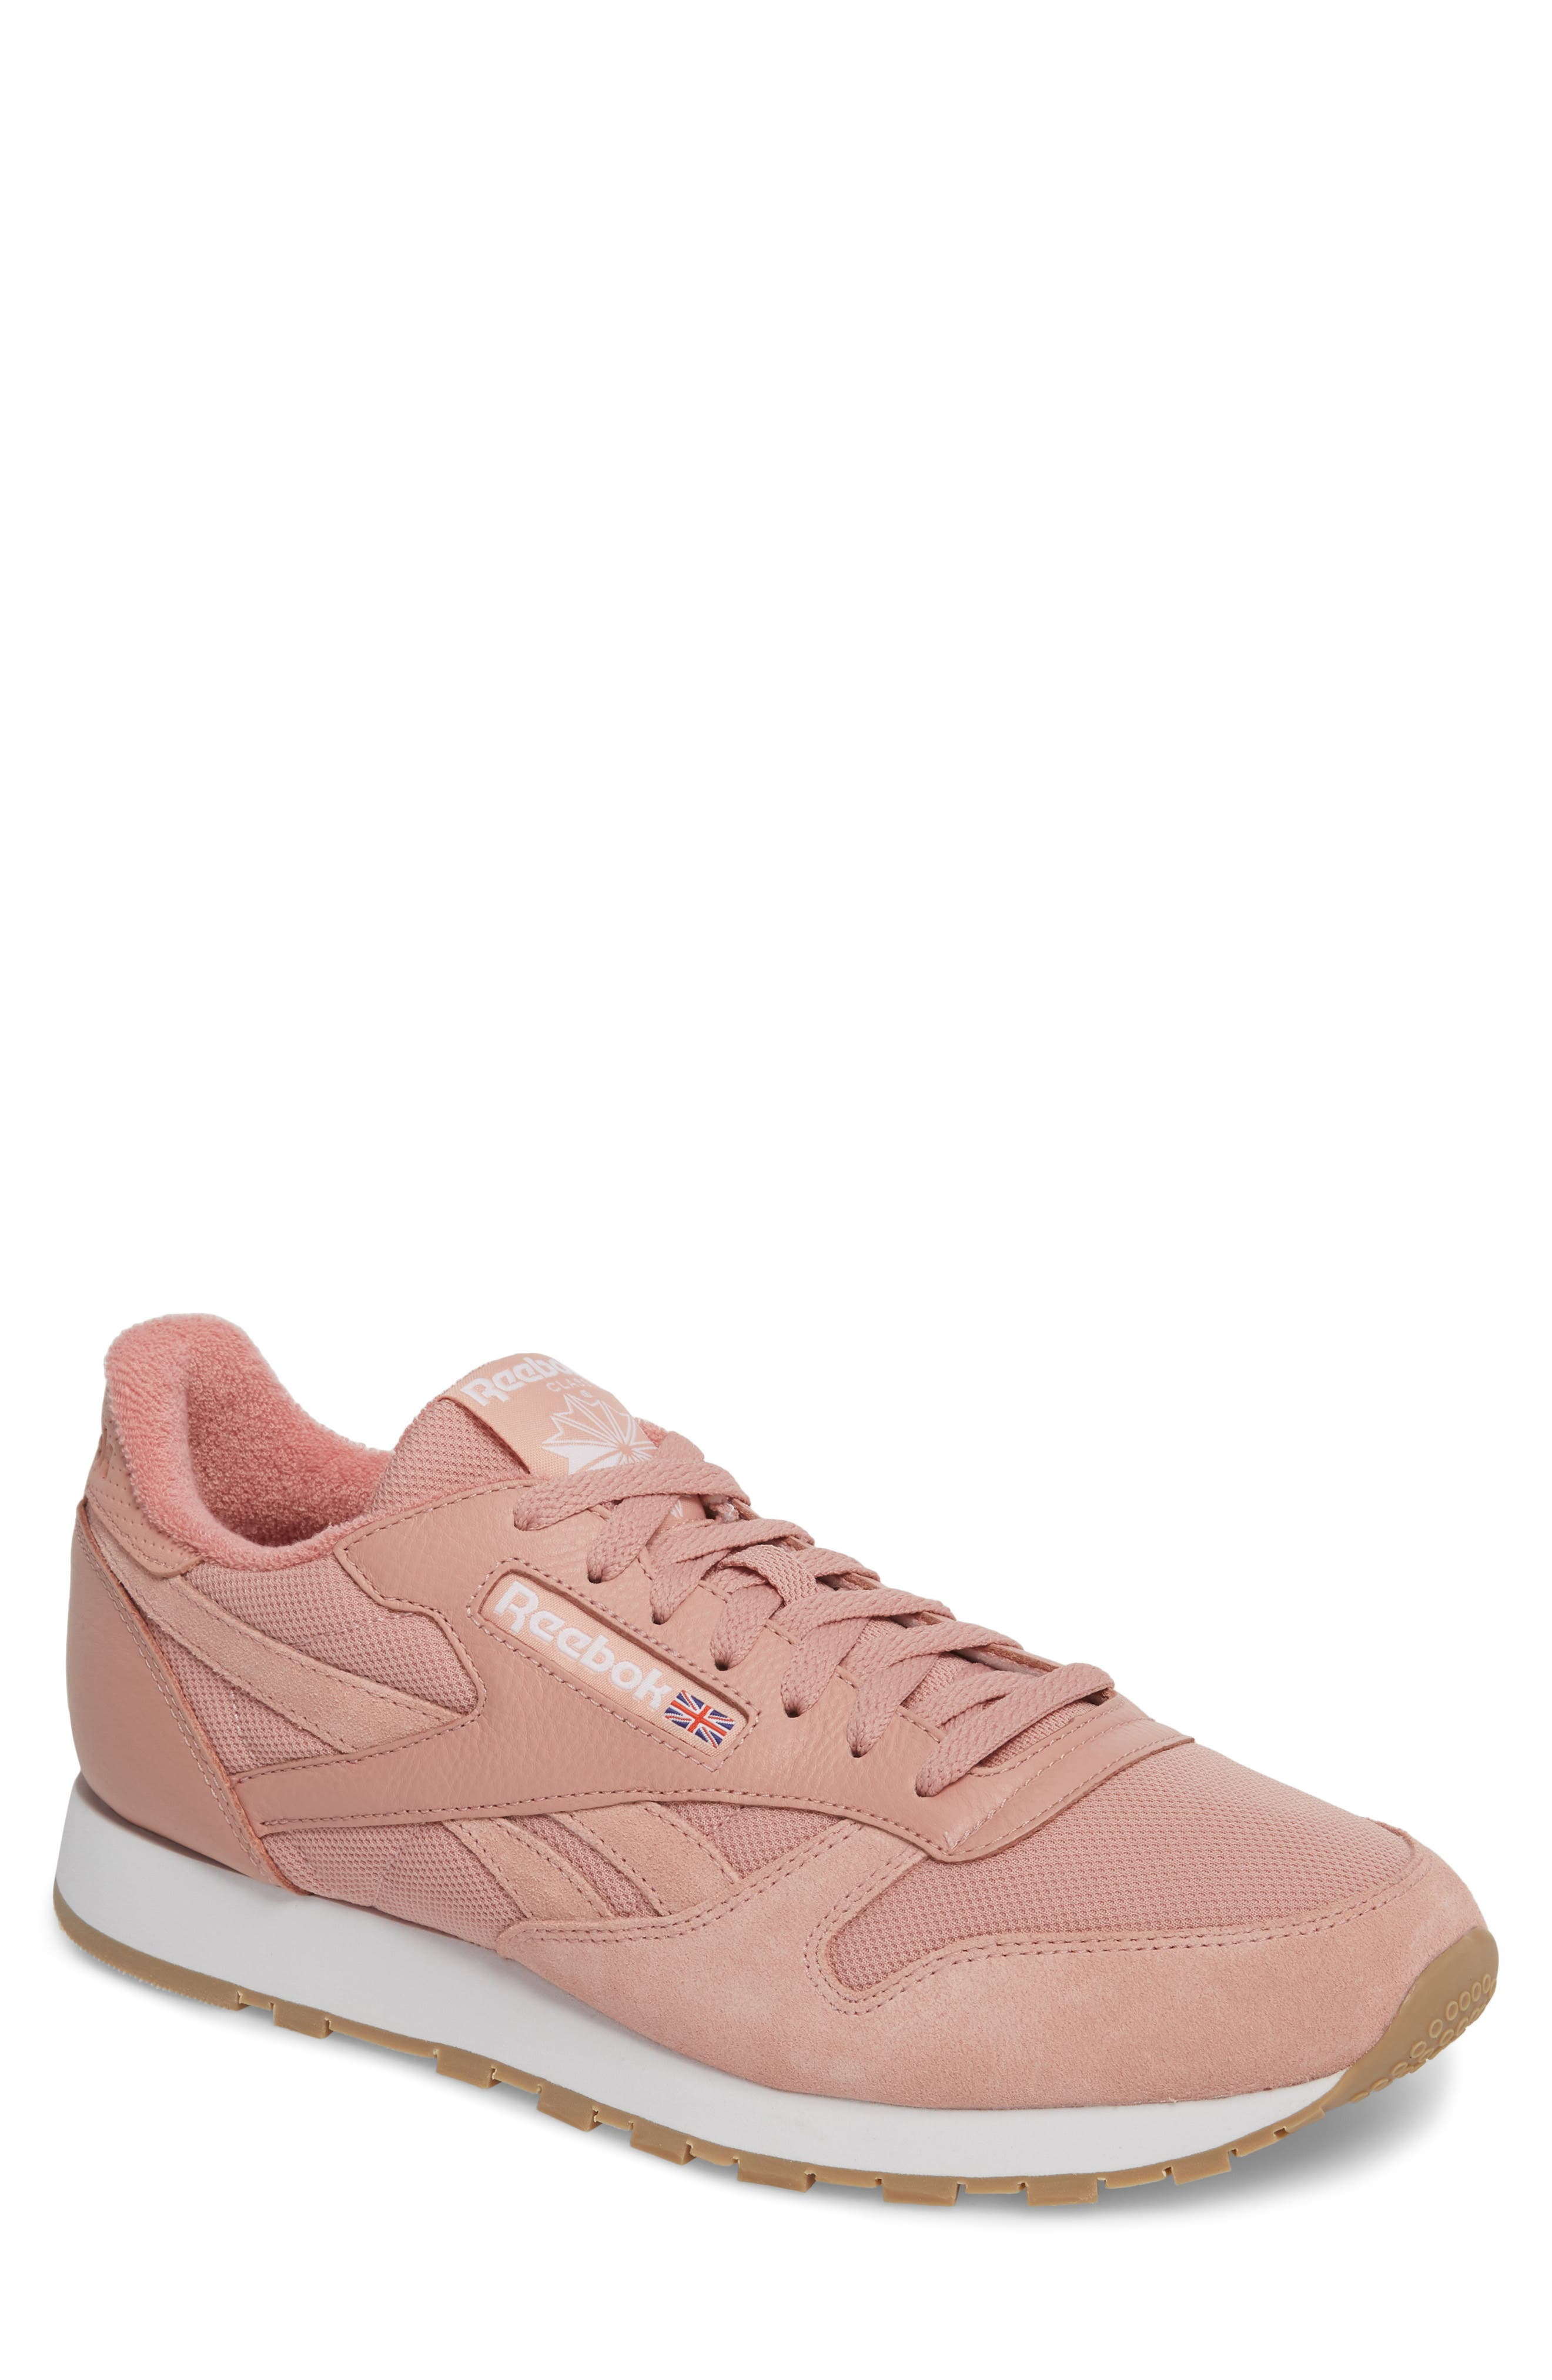 ESTL Classic Leather Sneaker,                             Main thumbnail 1, color,                             CHALK PINK/ WHITE